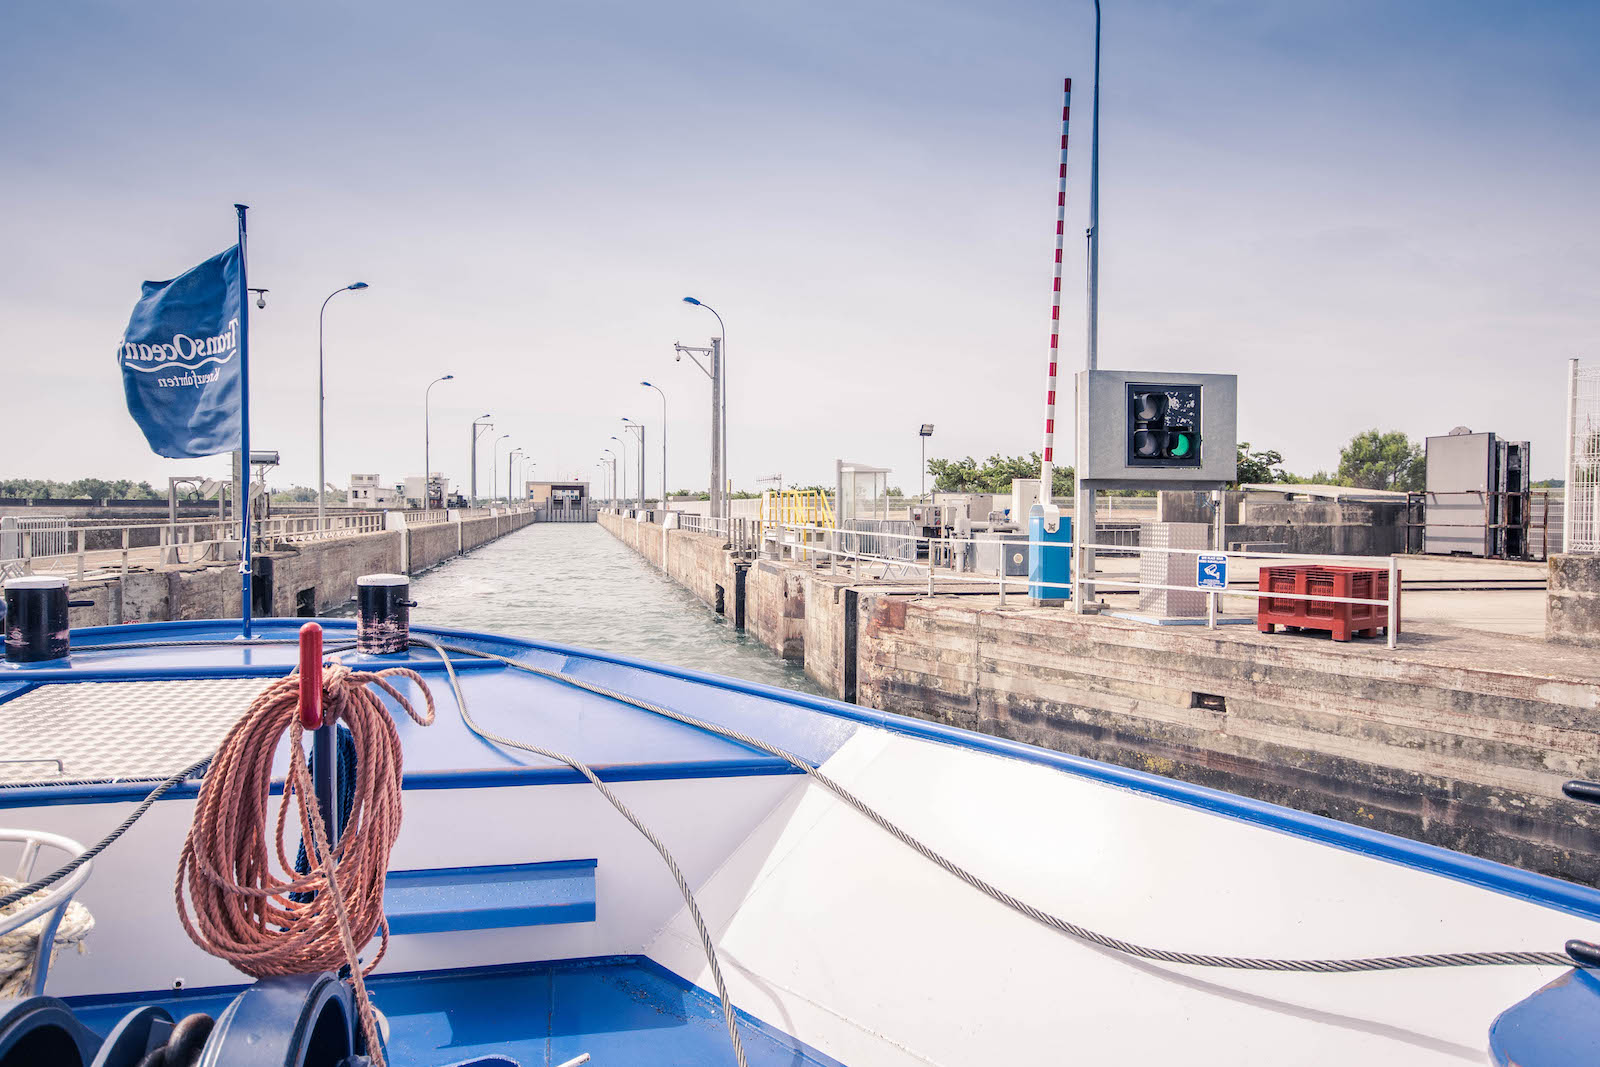 Flusskreuzfahrt-Schlleuse